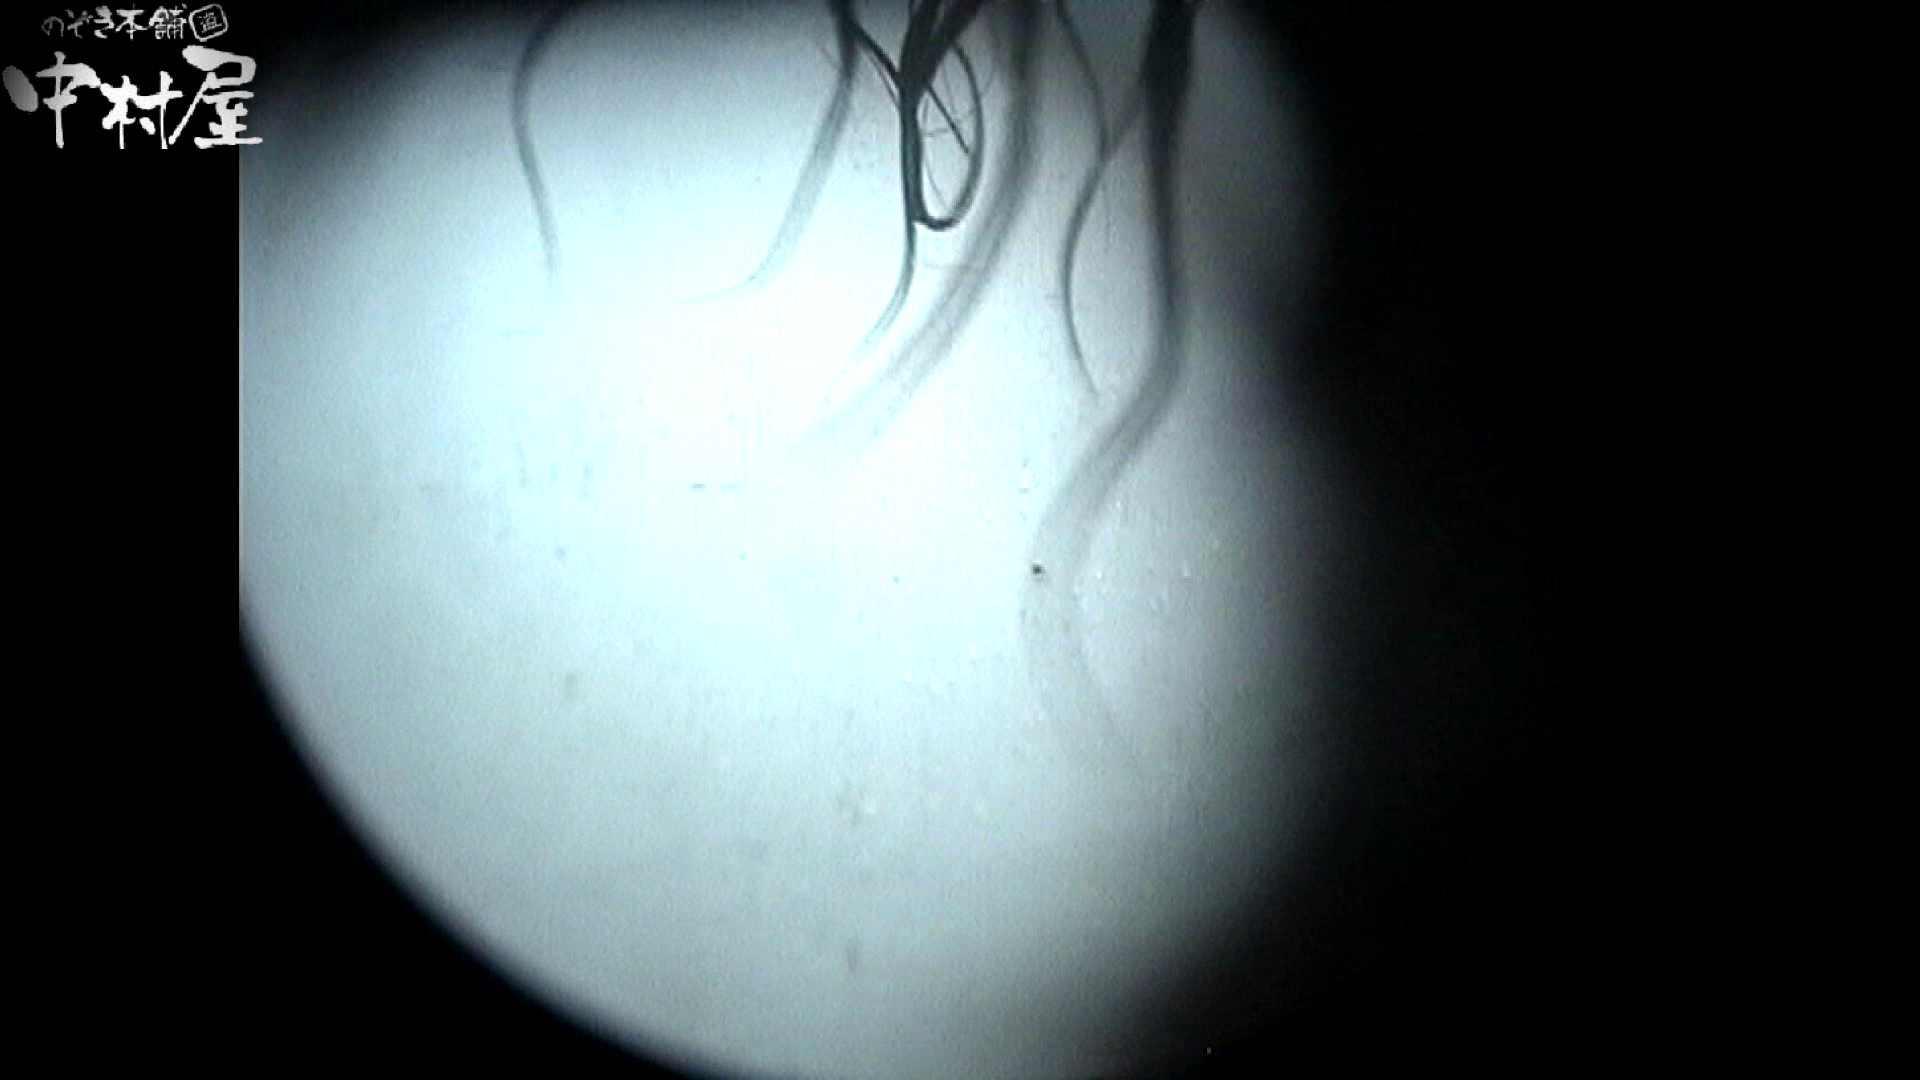 No.46 マシュマロ巨乳が目の前でプルプル 巨乳 おめこ無修正画像 78連発 11